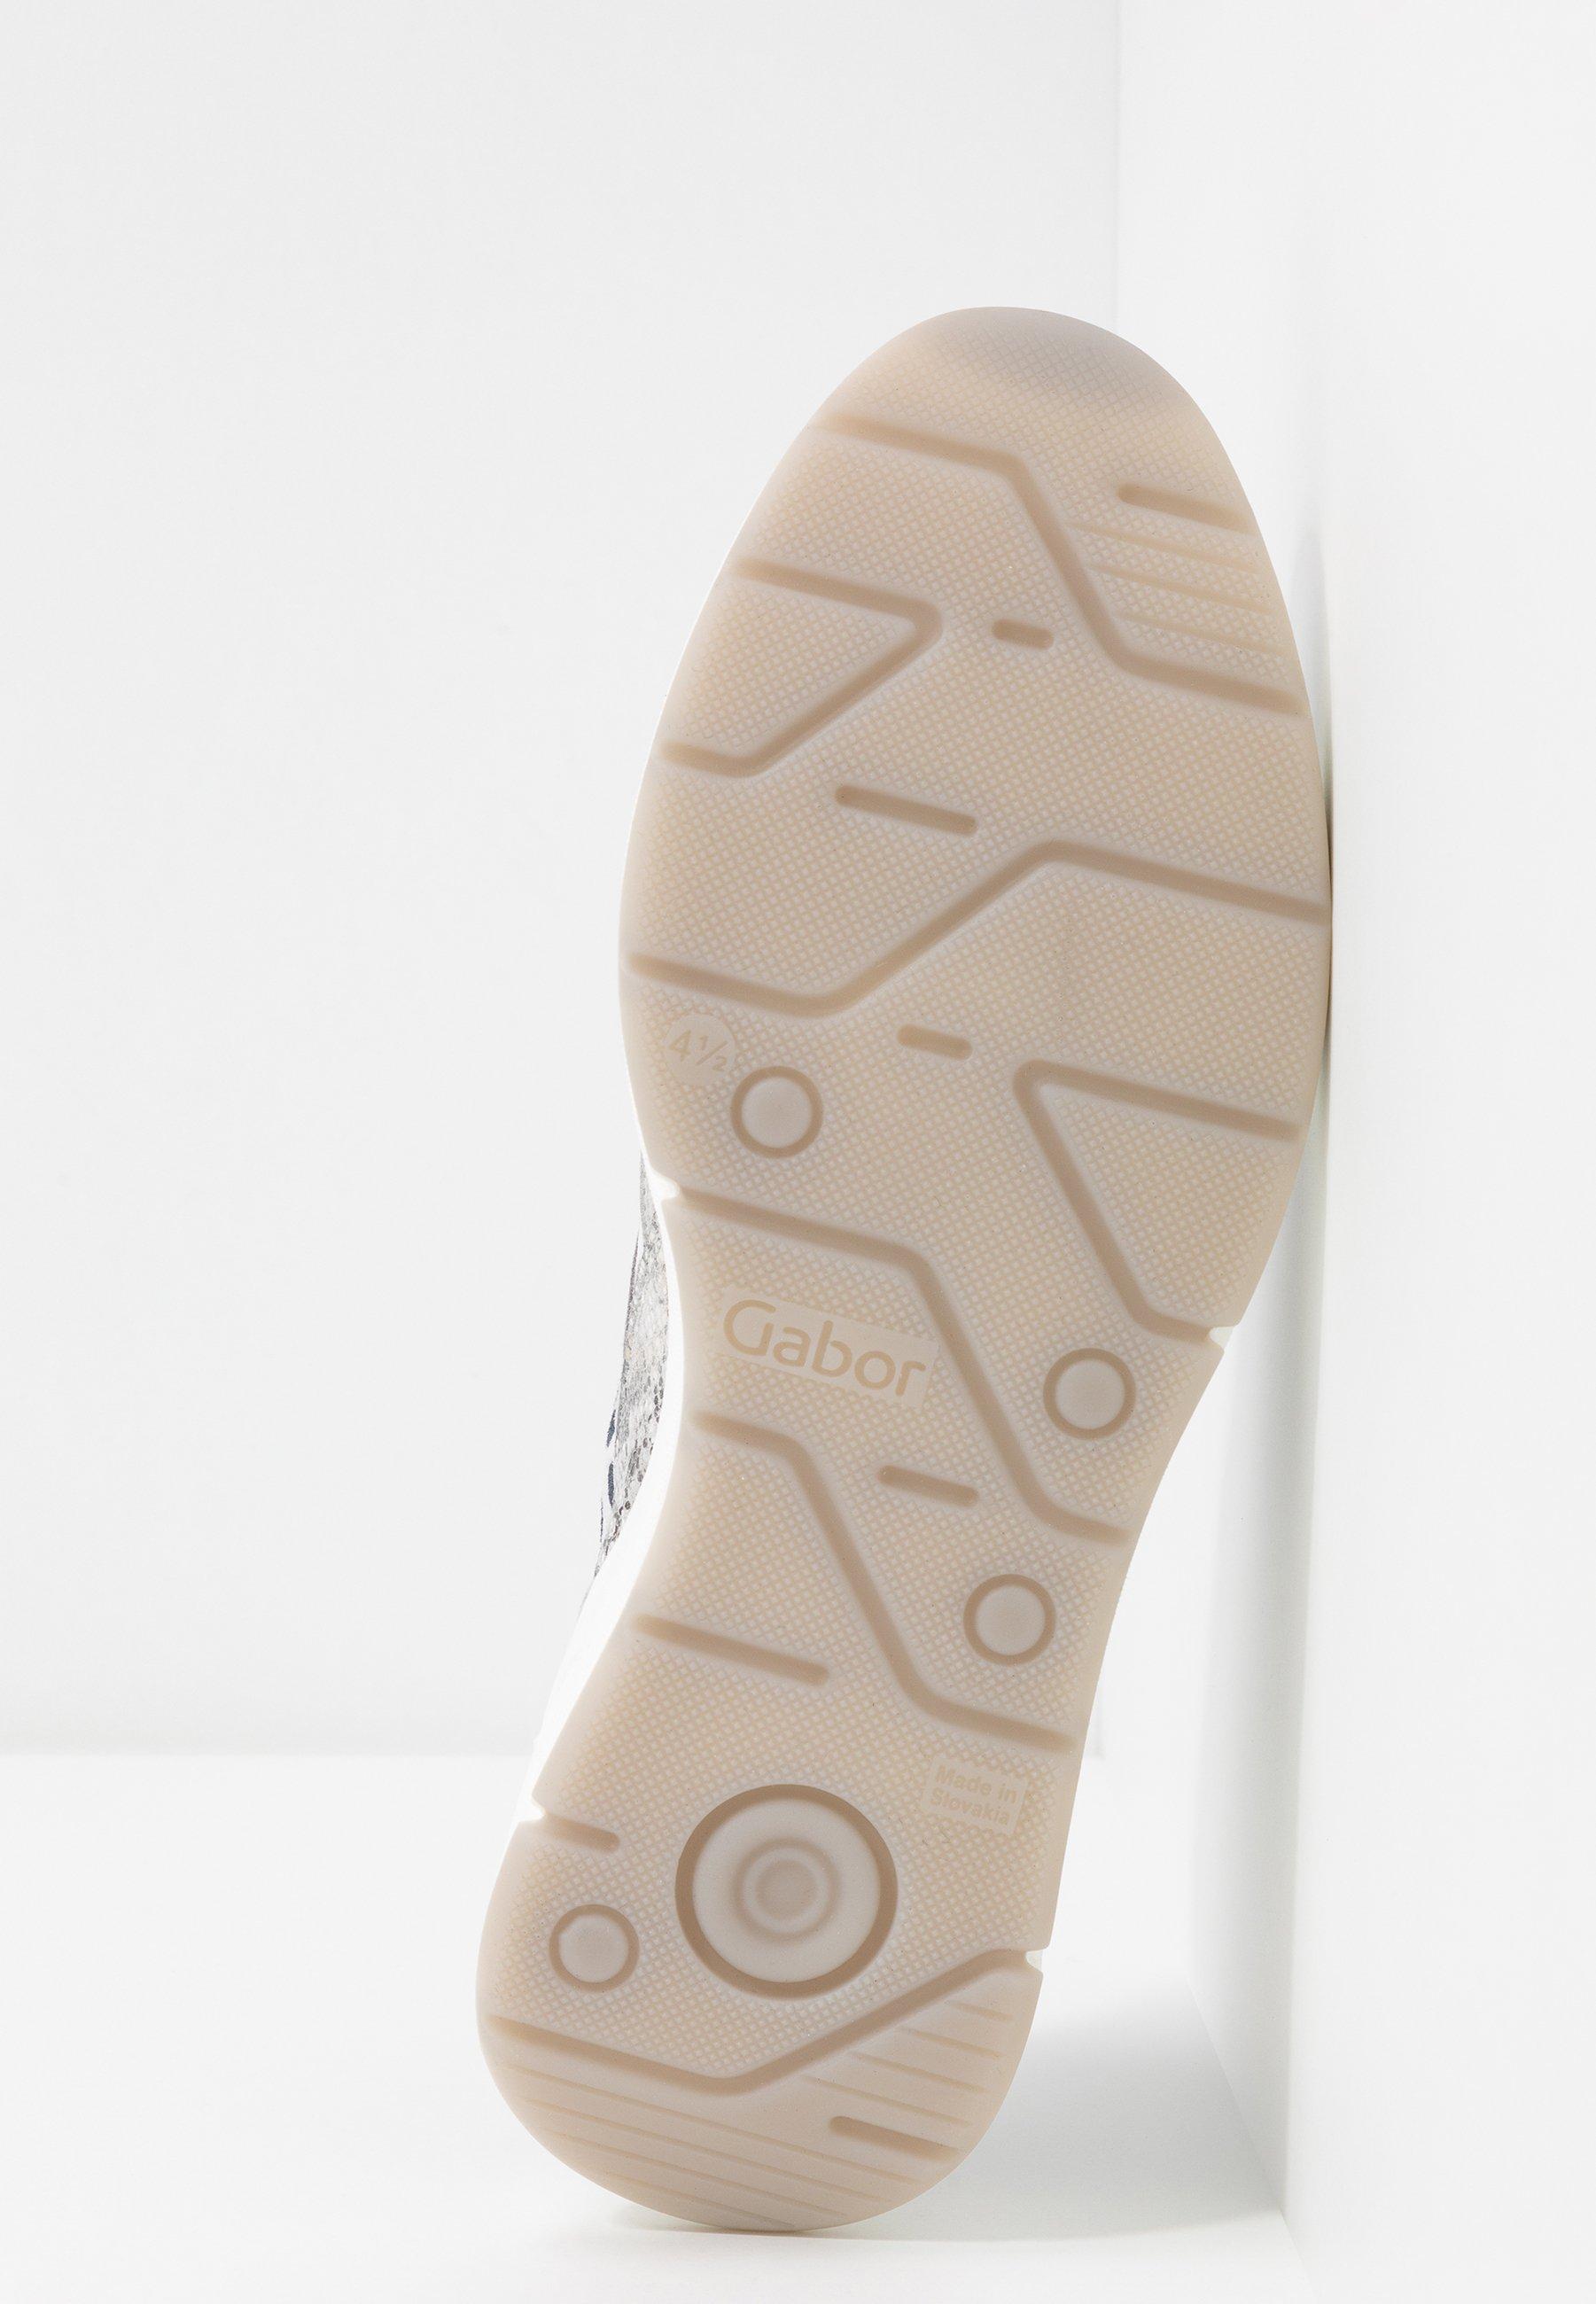 Gabor Comfort Sneakers - Light Grey/silber